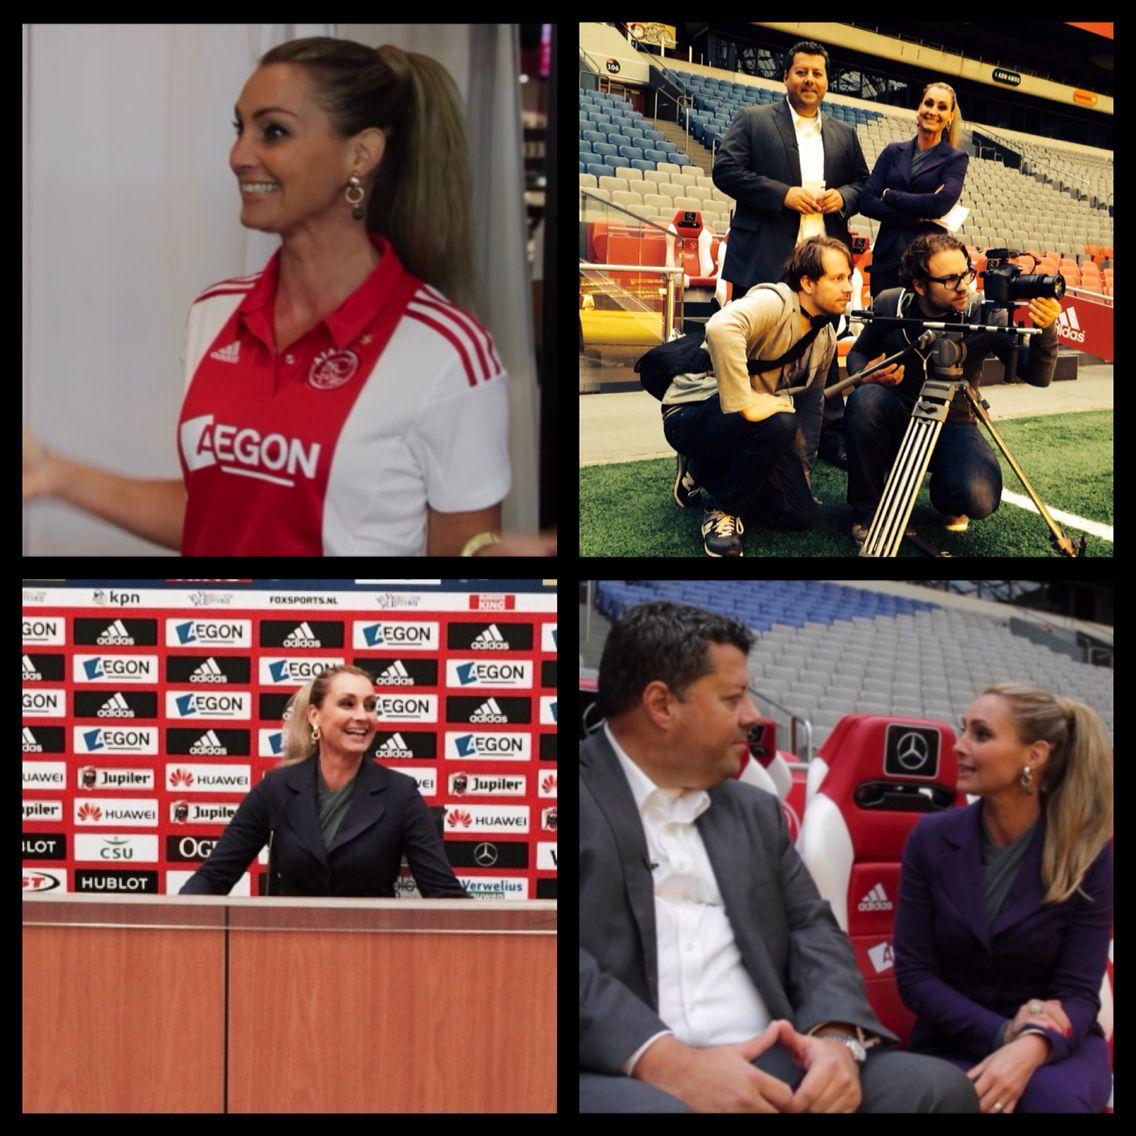 Opname LXRYTV Finance Rtl4 bij Ajax Arena Amsterdam (met